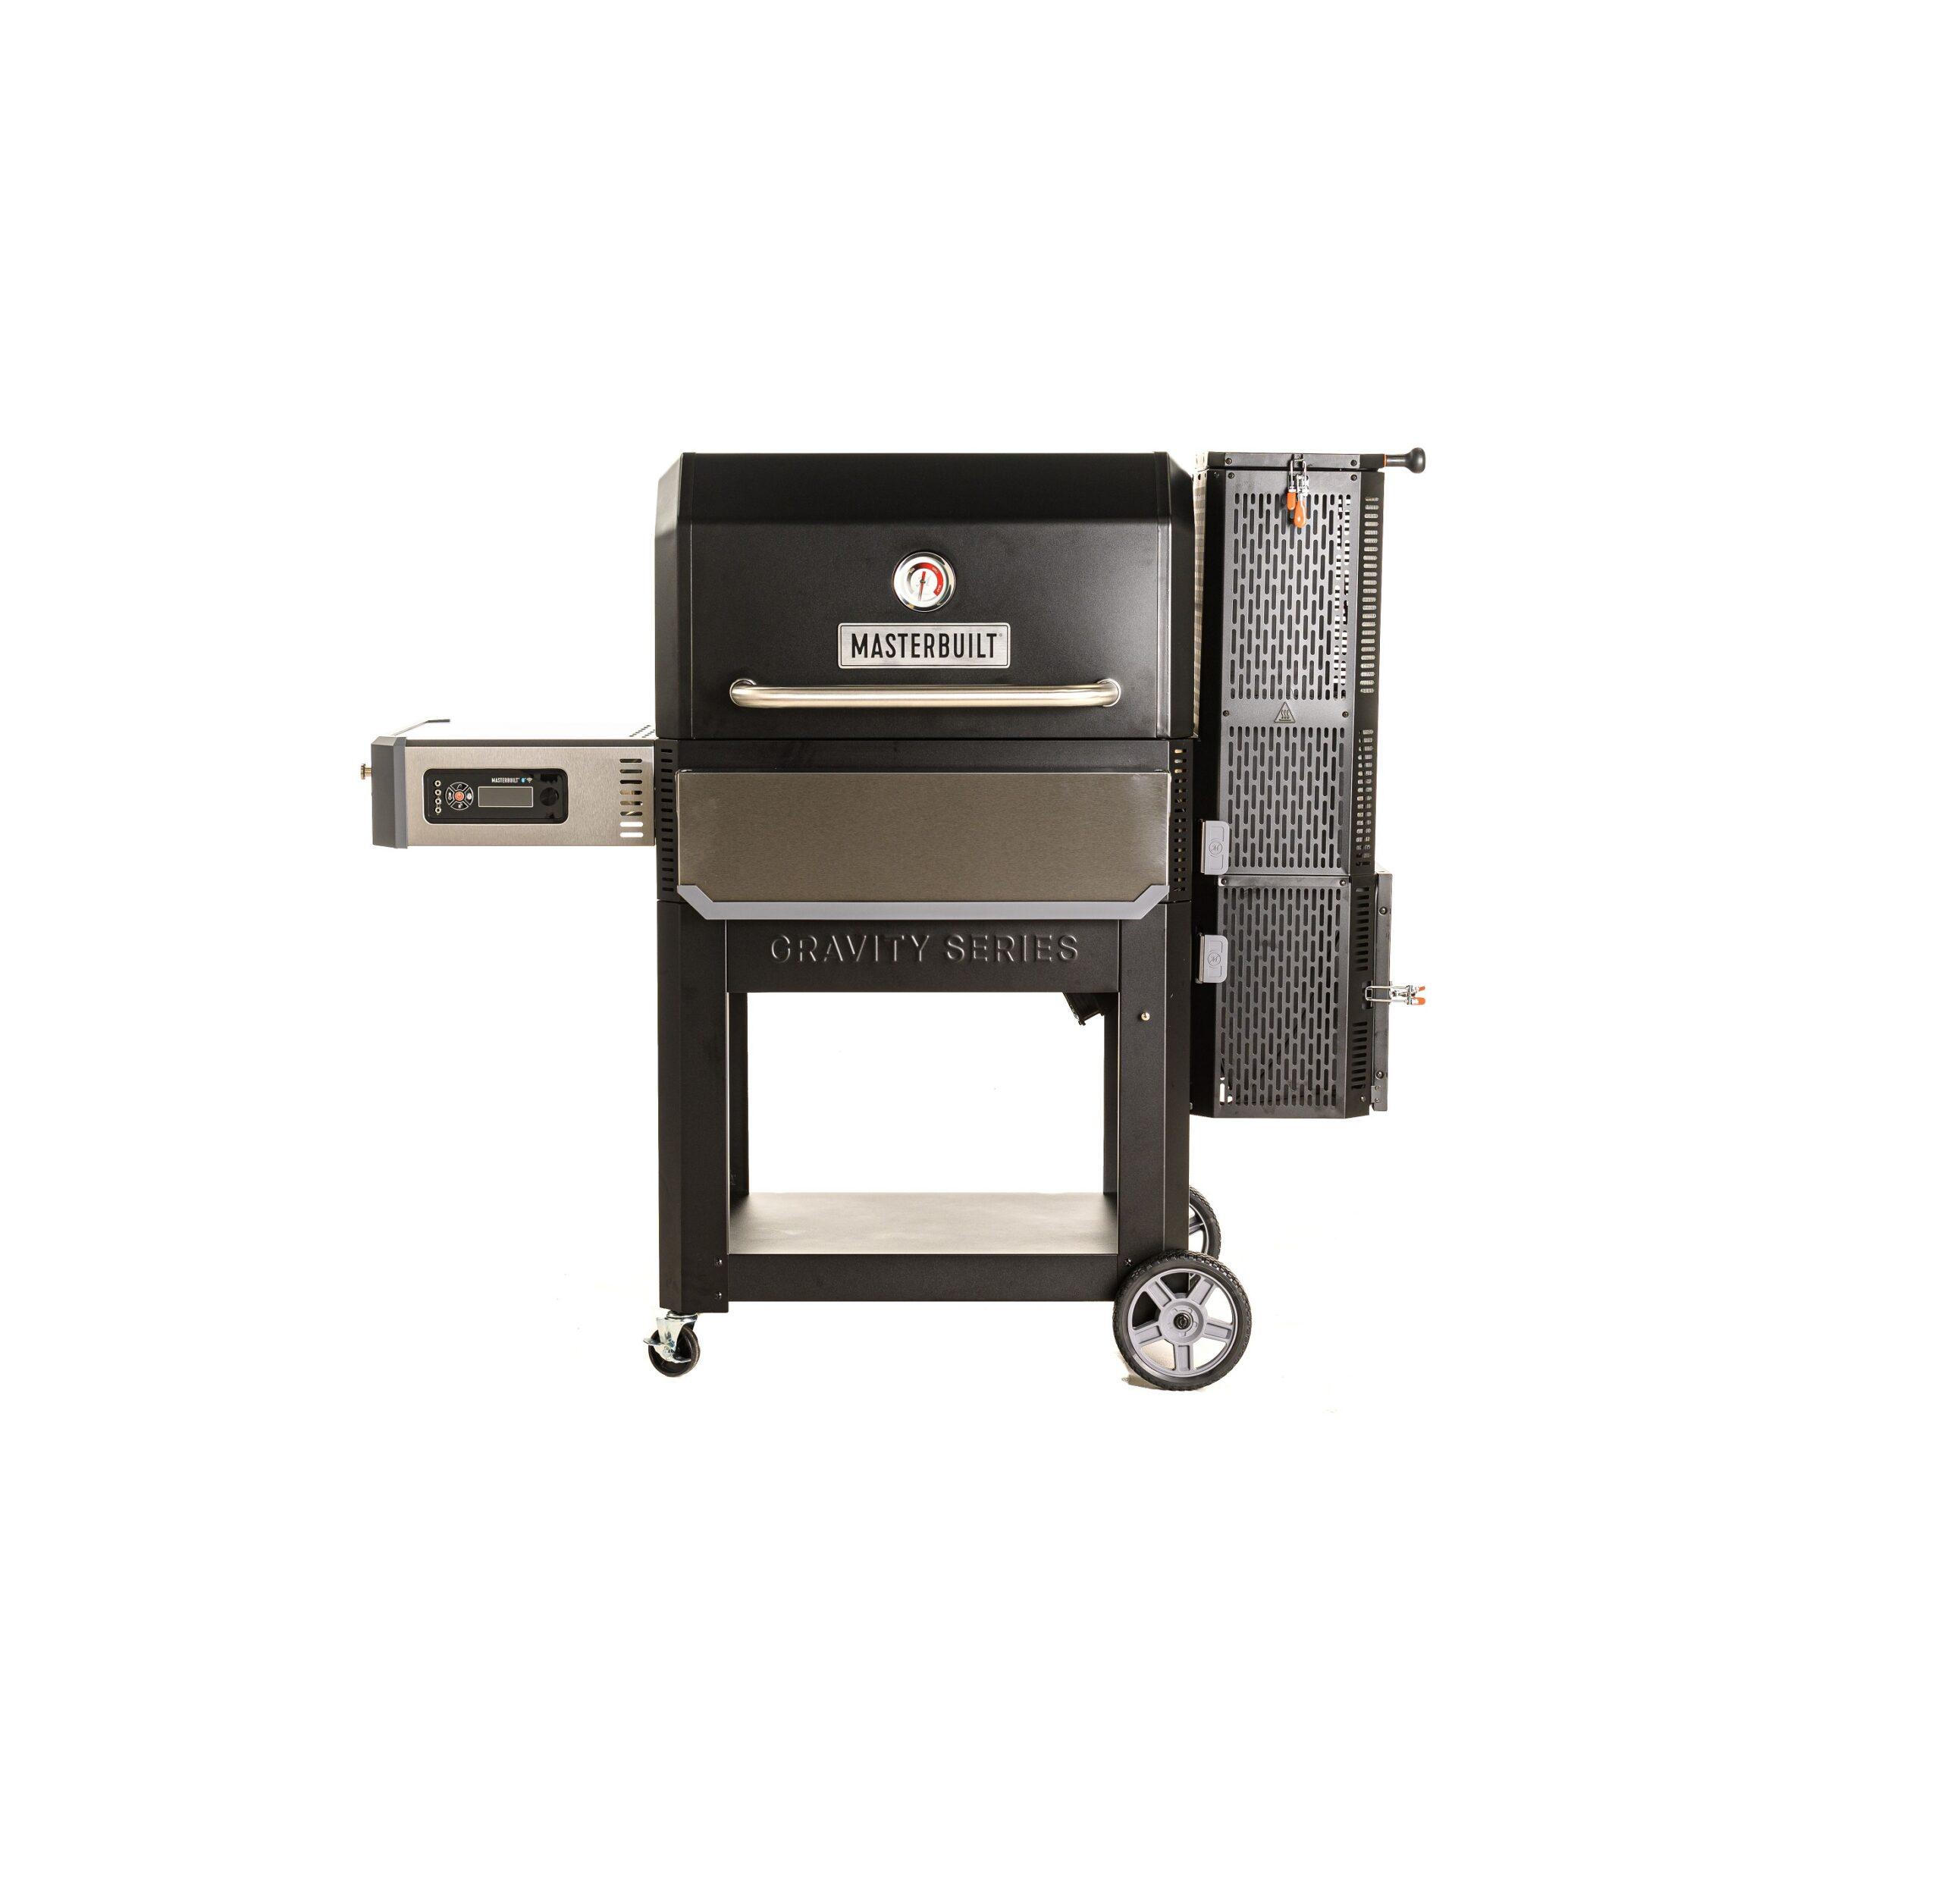 Masterbuilt Gravity Series 1050 Digital Charcoal Grill & Smoker